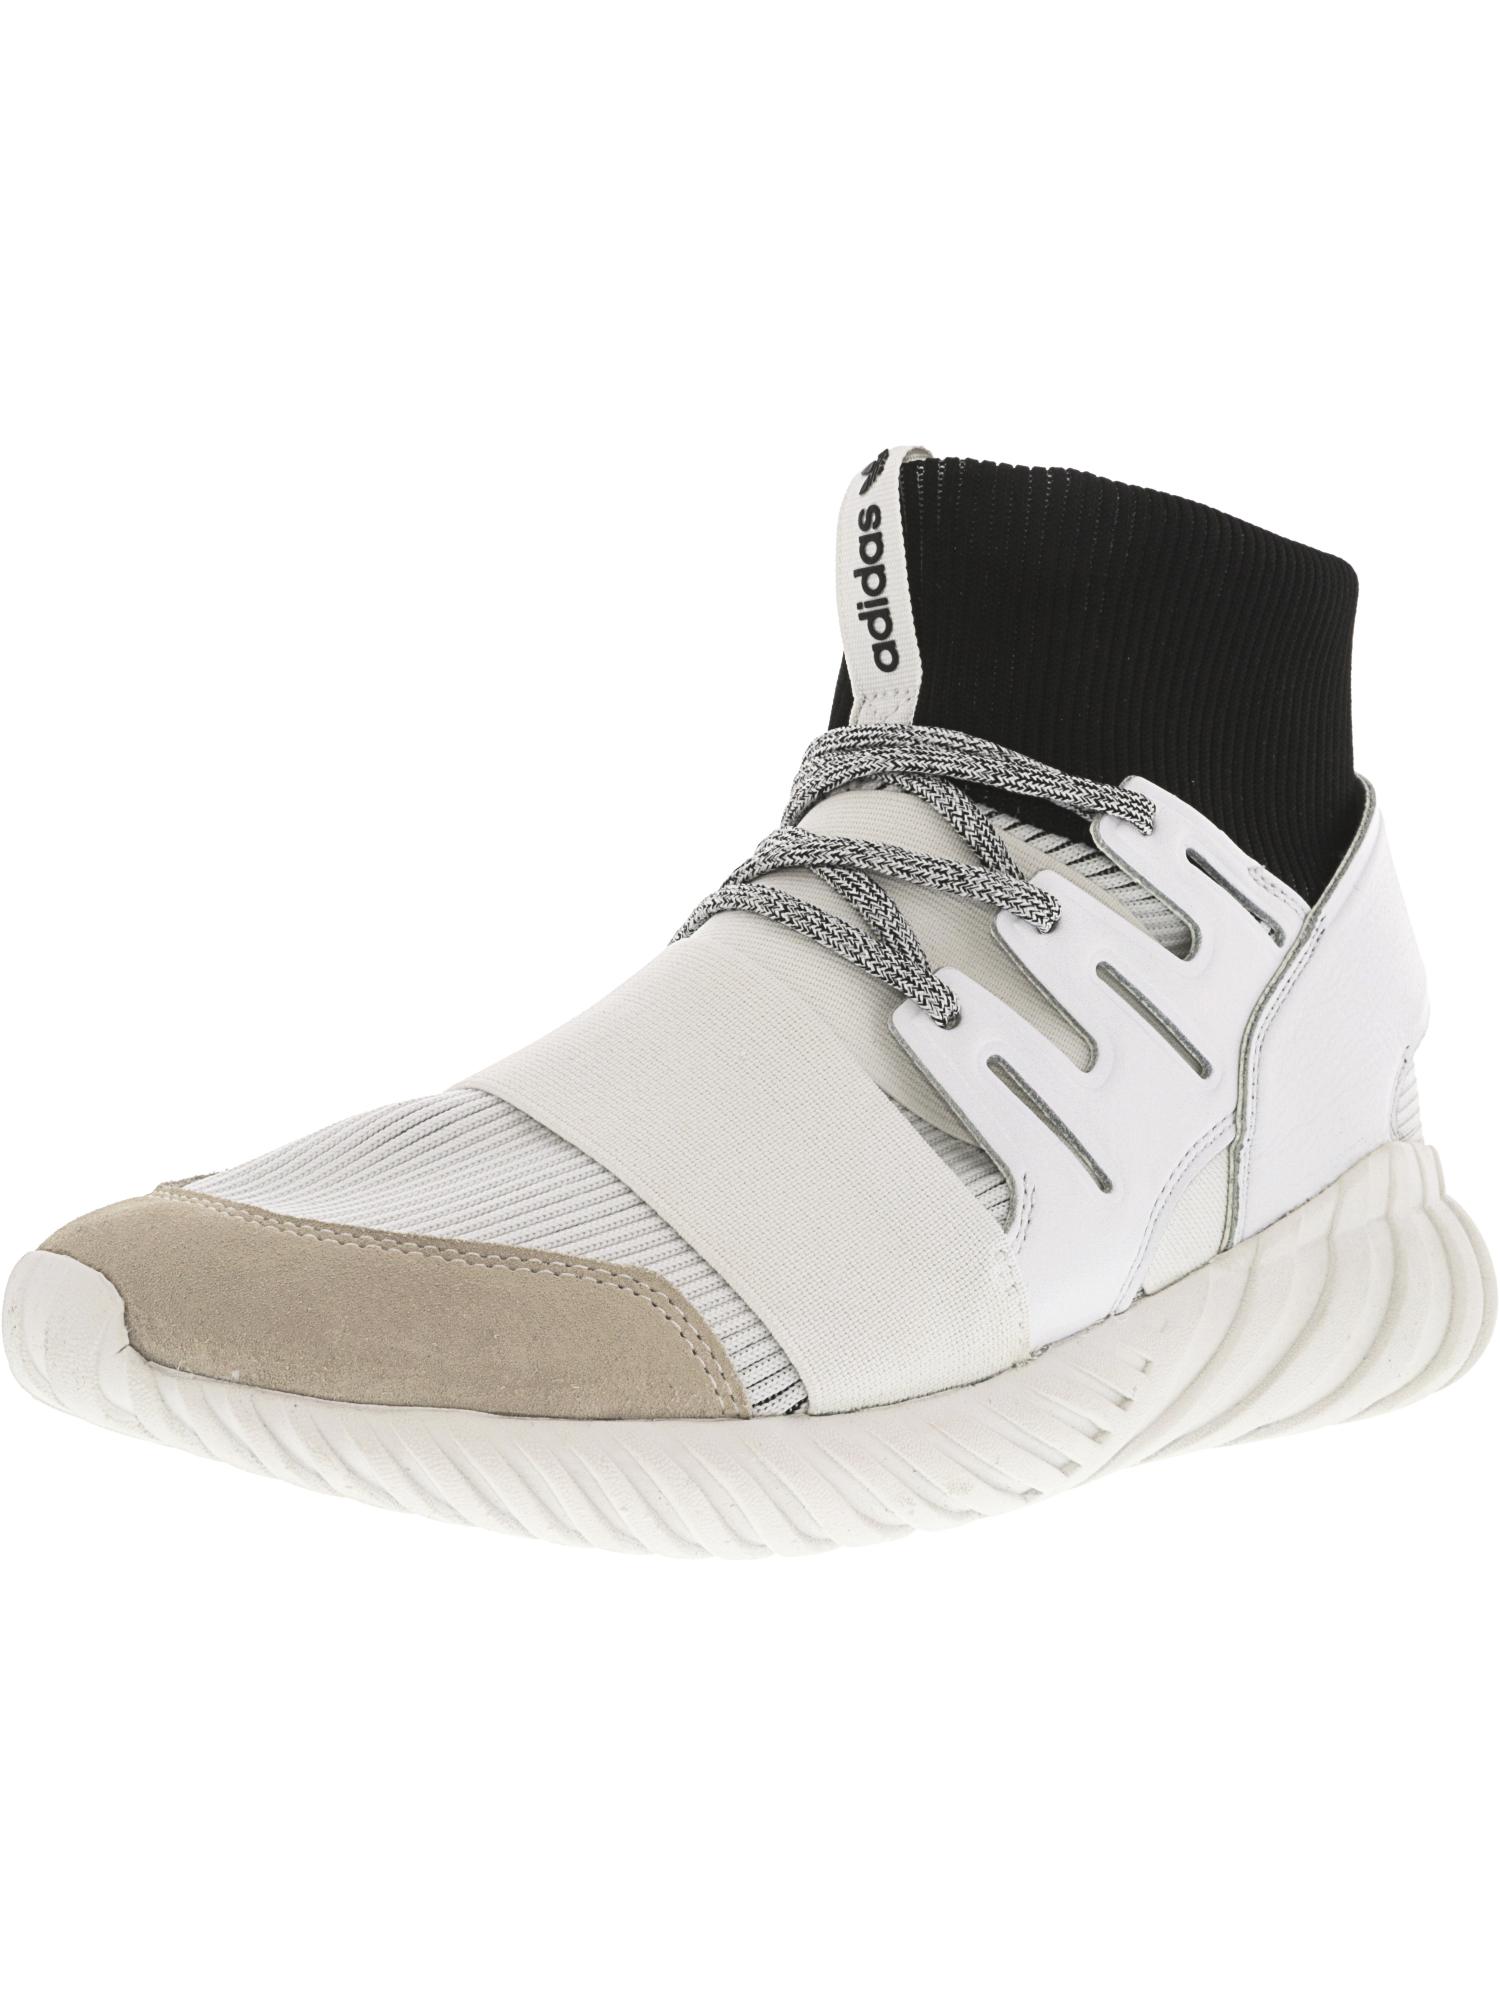 adidas uomini tubolare alta moda scarpe ebay doom